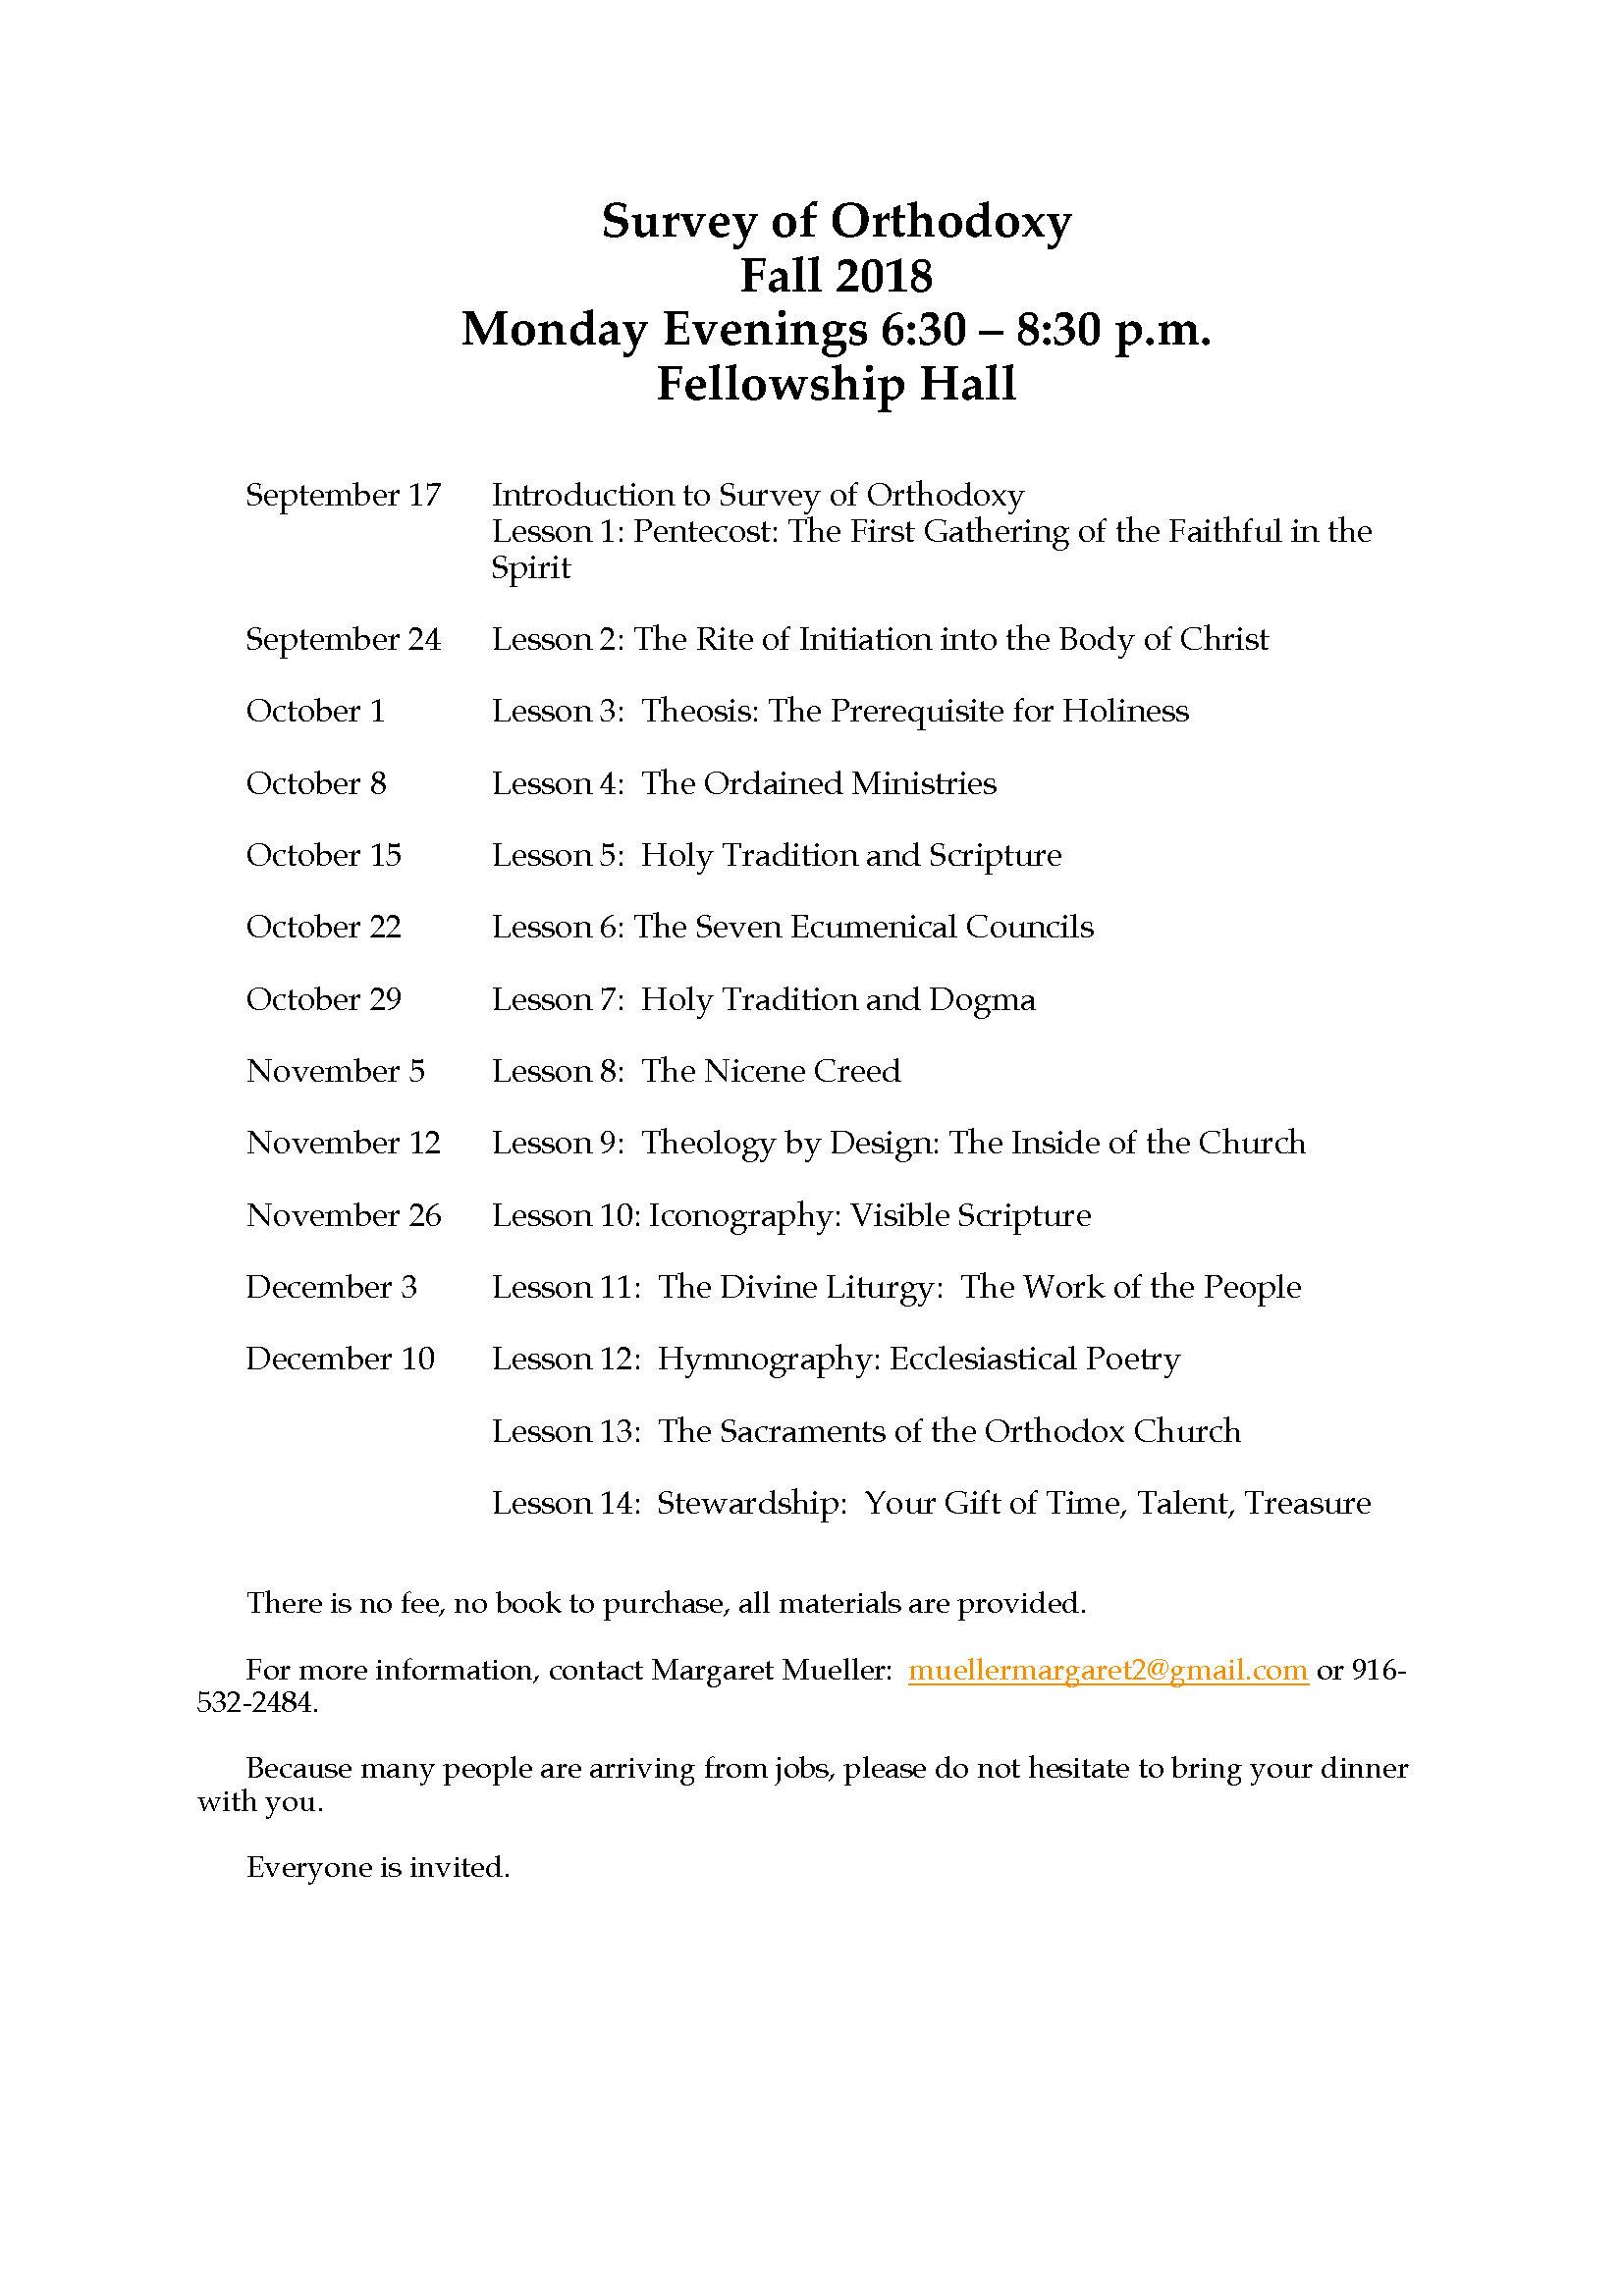 Survey of Orthodoxy Fall 2018.jpg